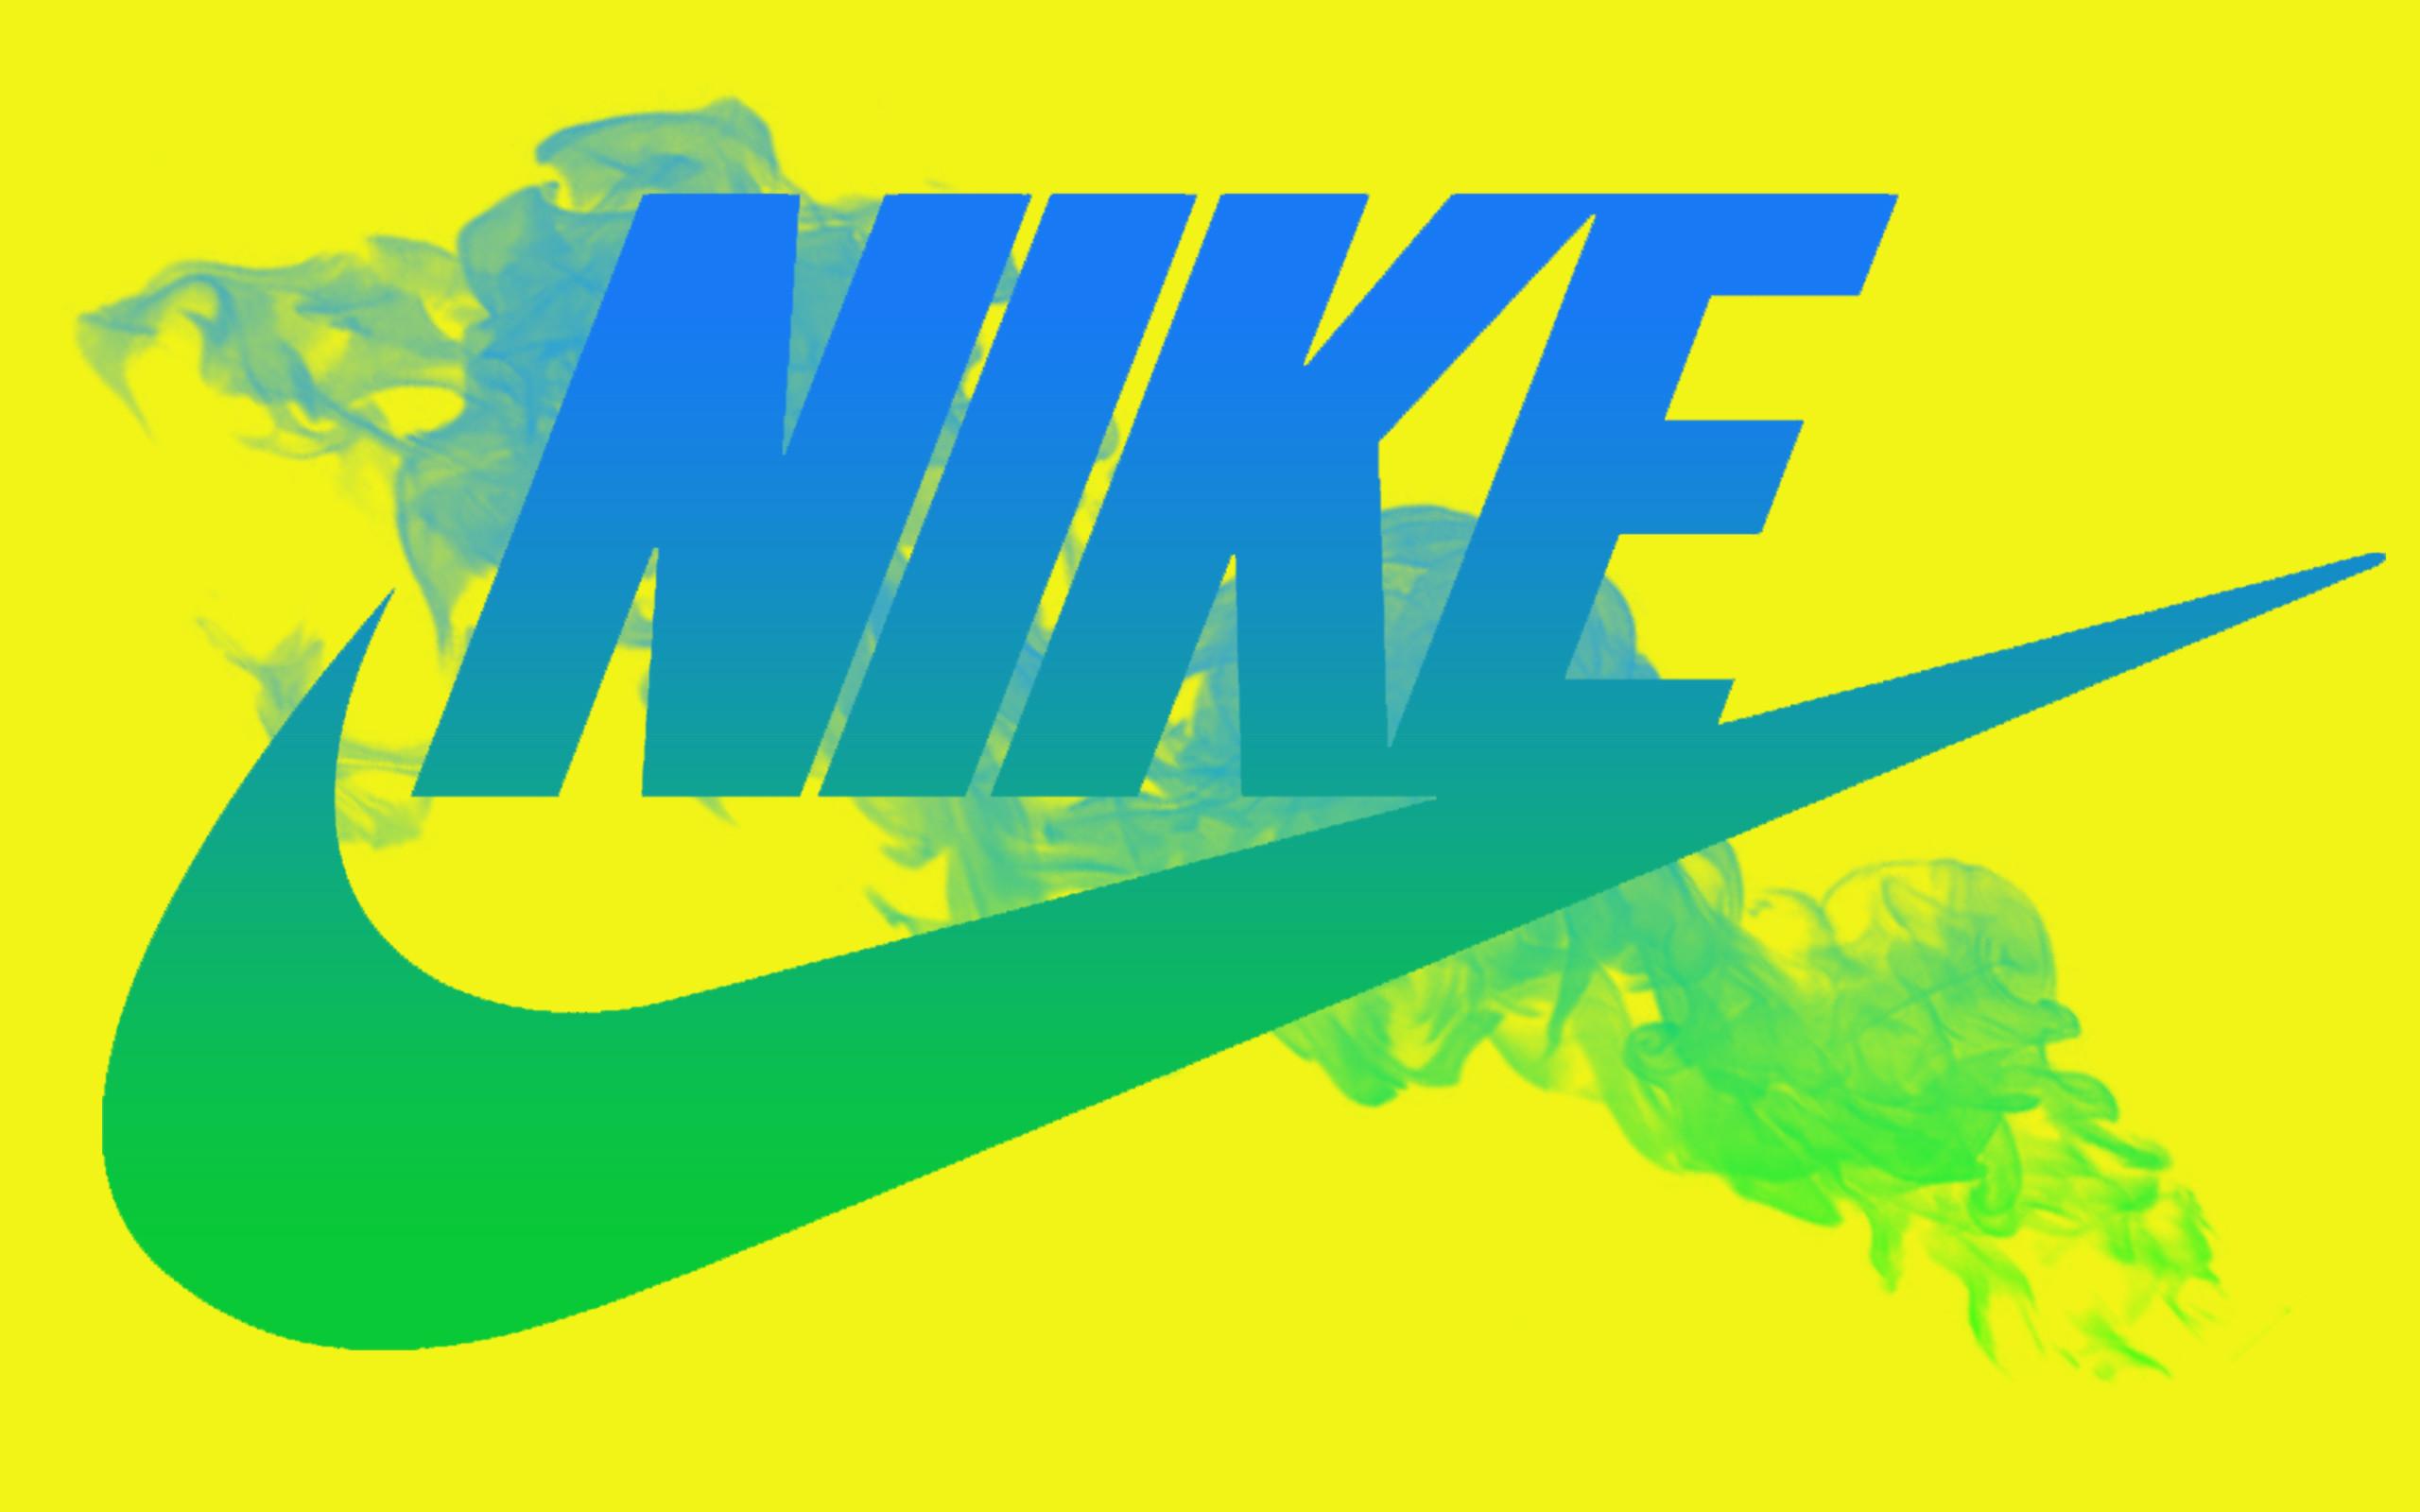 Neon Nike Google Skins, Neon Nike Google Backgrounds, Neon Nike Google .